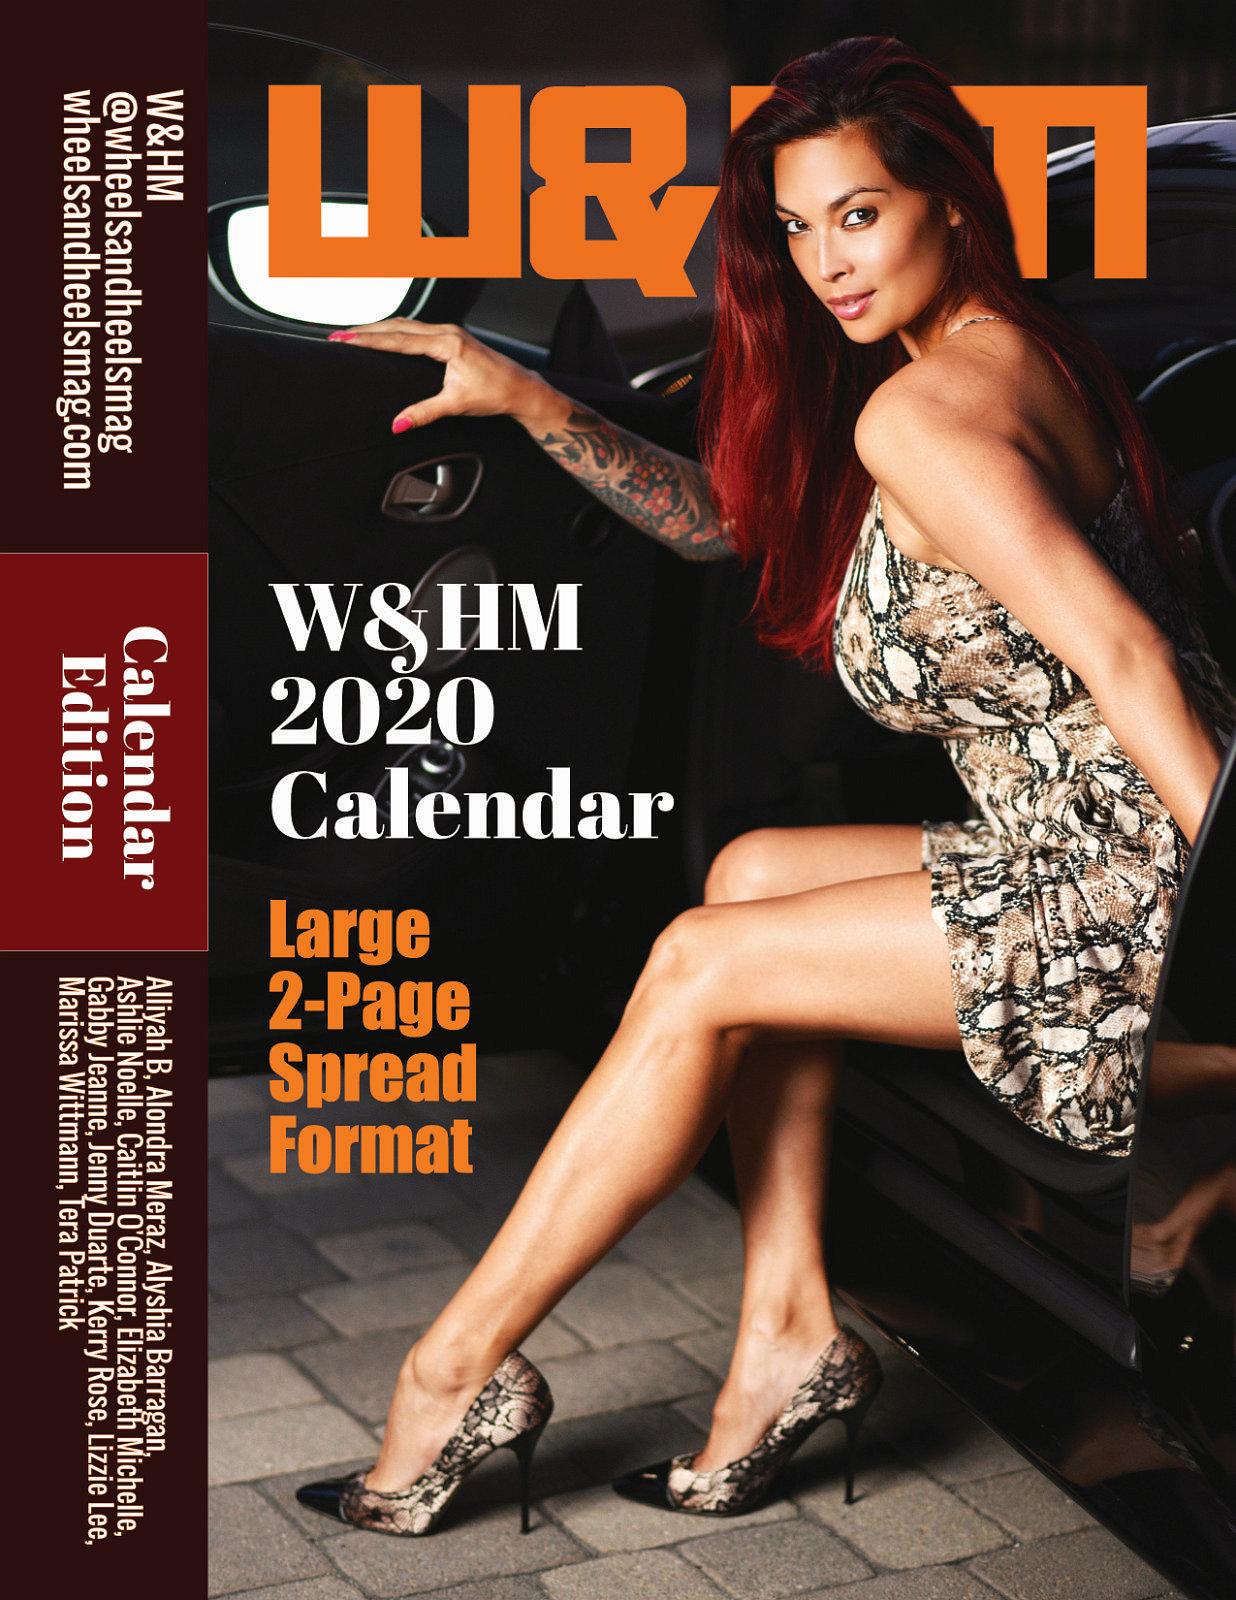 W&HM 2020 Calendar